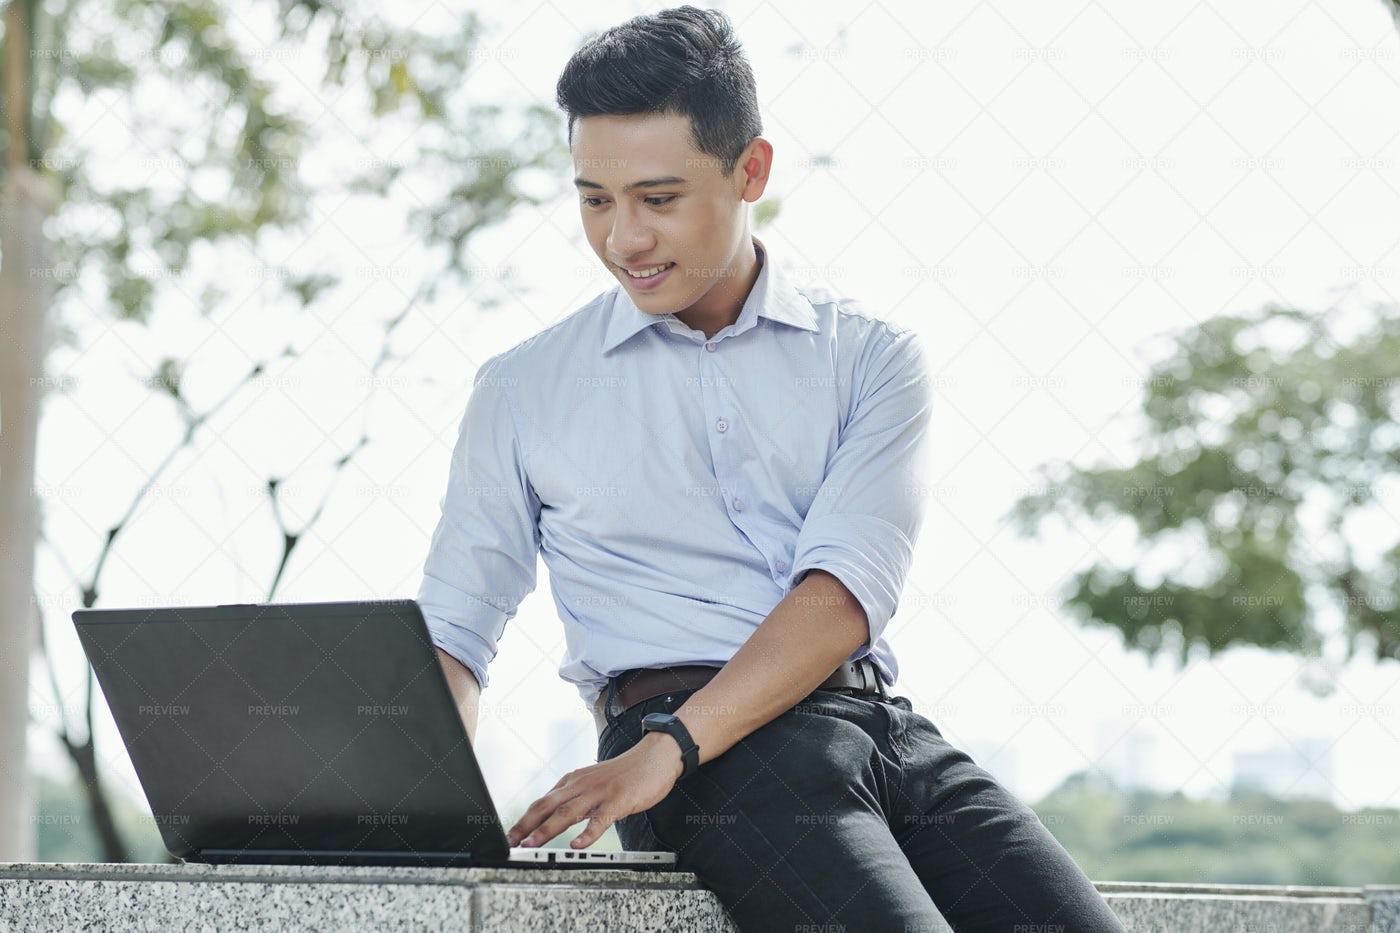 Software Developer Working On Laptop: Stock Photos